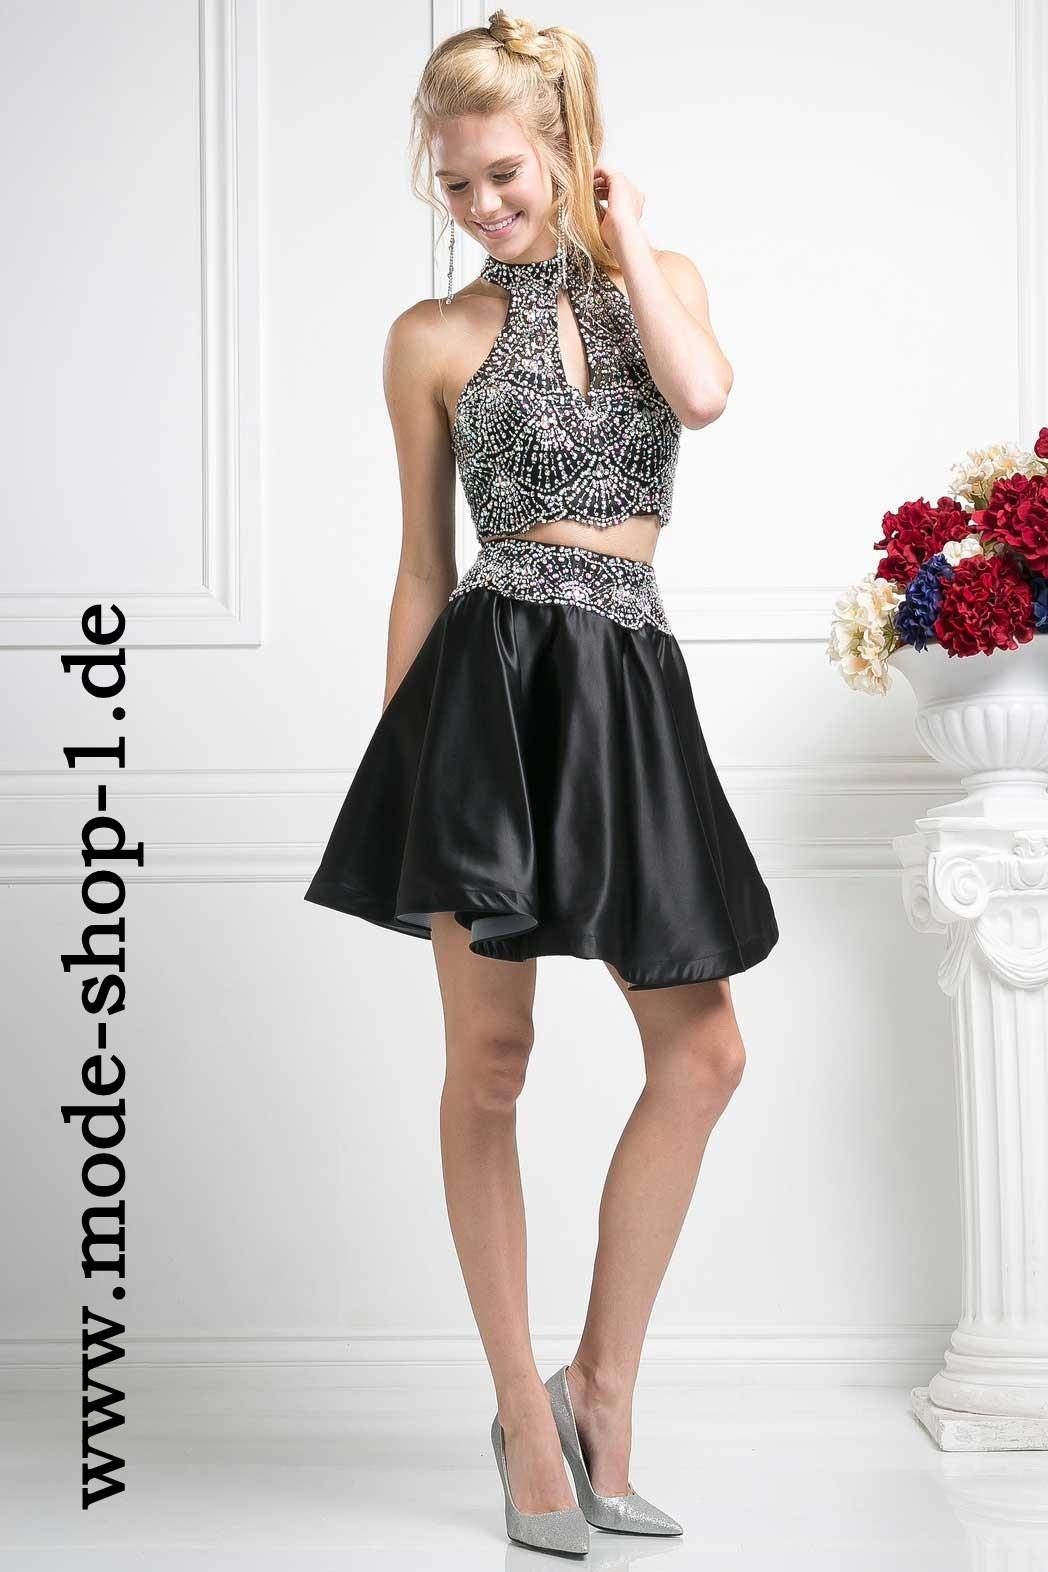 Modewelten die besten Mode Shops | Damenmode 2019 Online ...